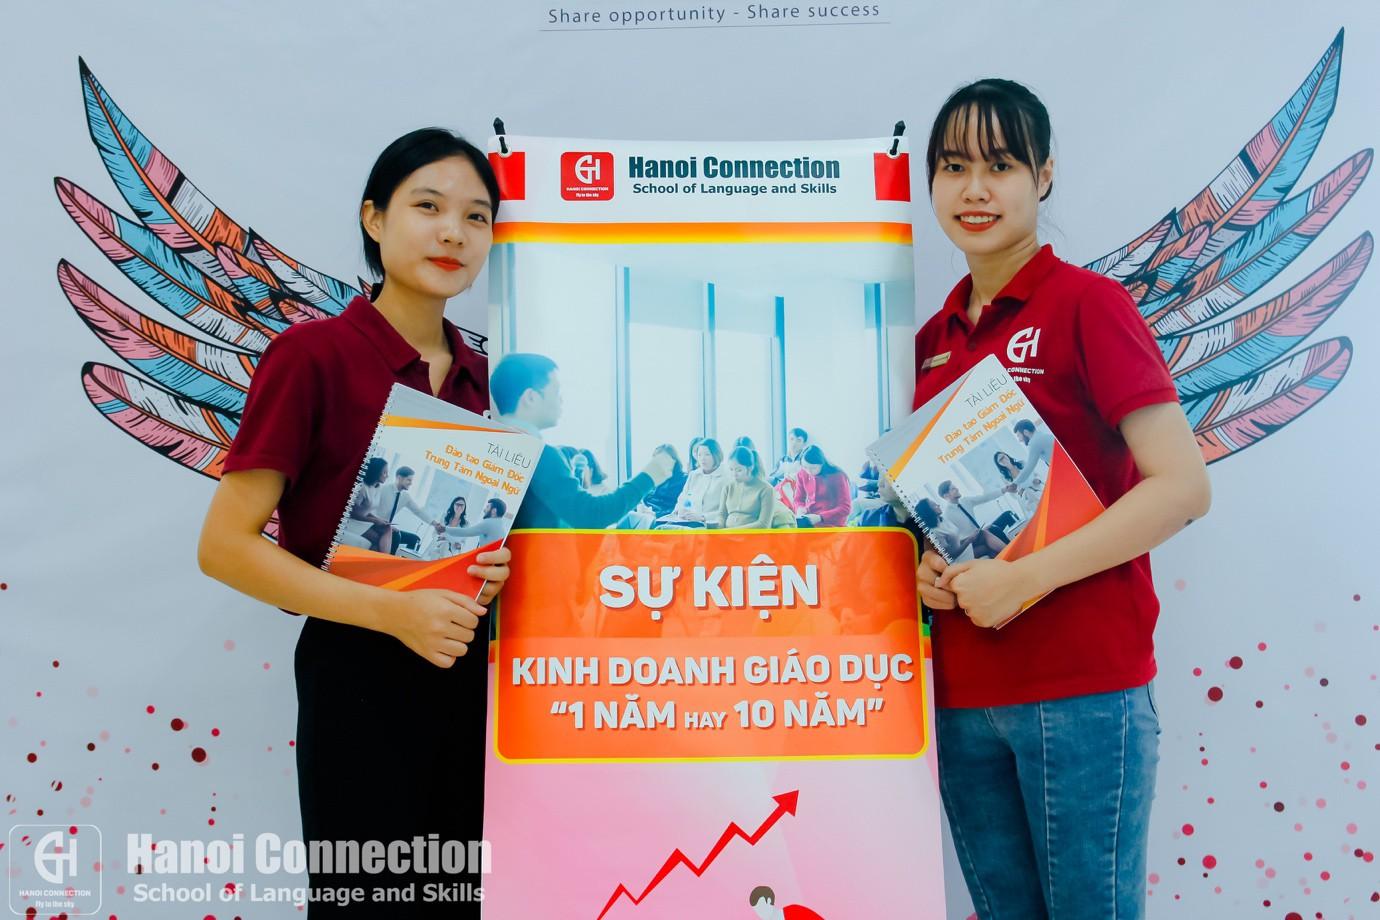 hanoi connection, saigon connection - photo 1 1564040983167967334848 - Hanoi Connection – Saigon Connection, 2 thương hiệu 1 uy tín